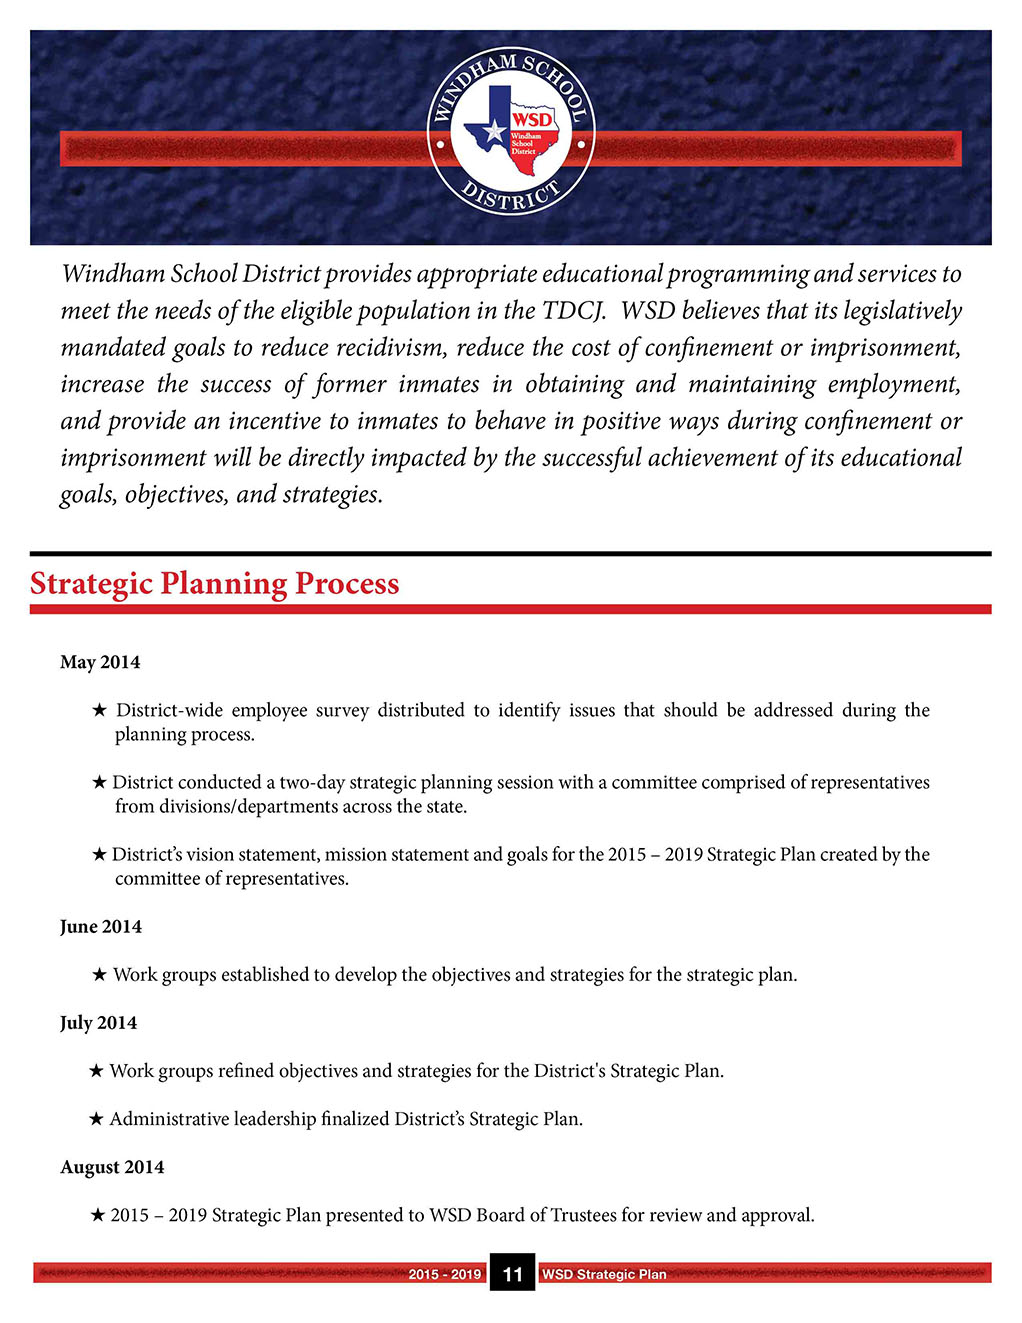 Strategic Plan 2015-2019